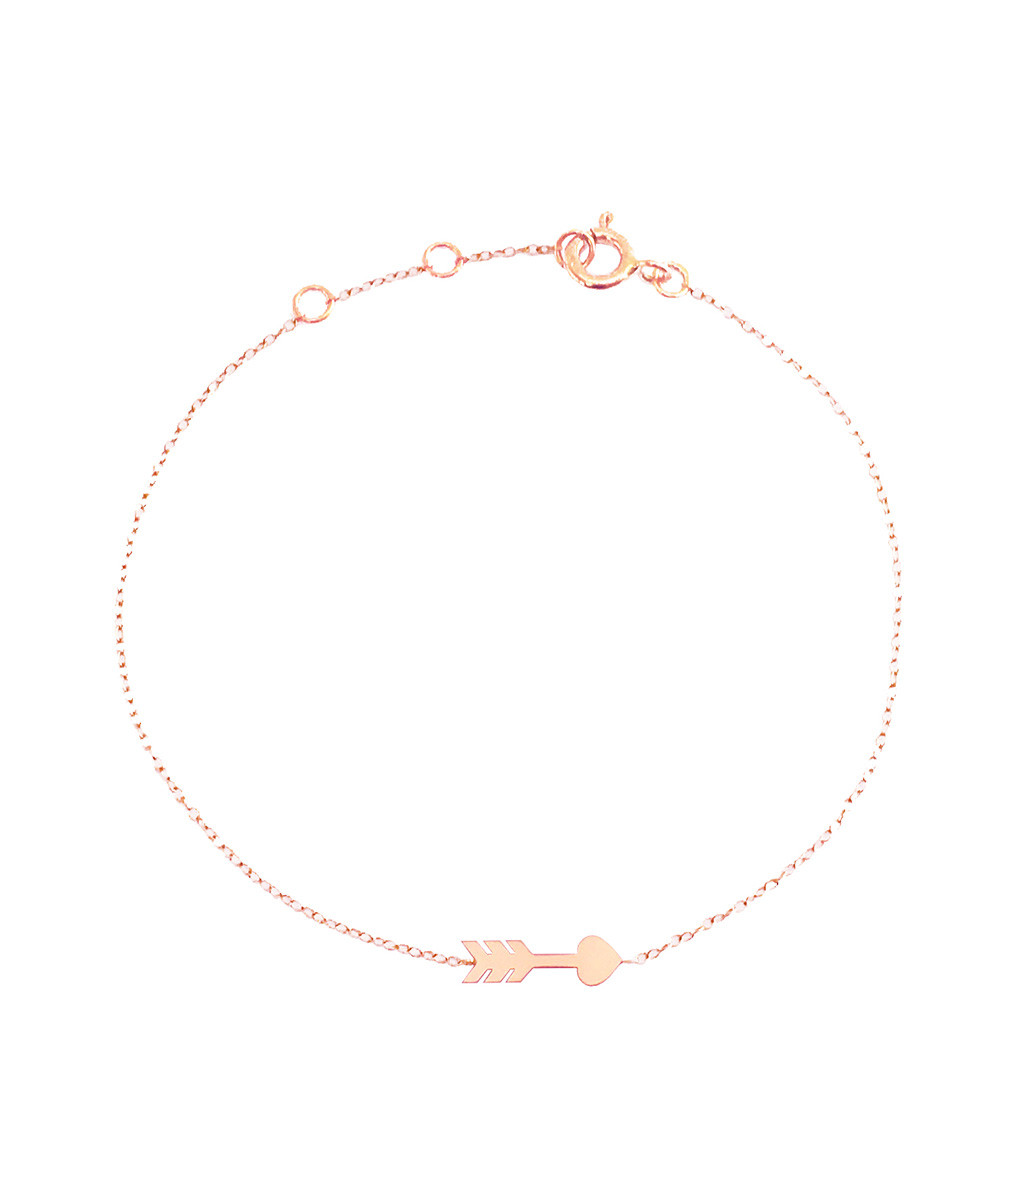 CHIBCHA - Bracelet Chaîne Or Techihila